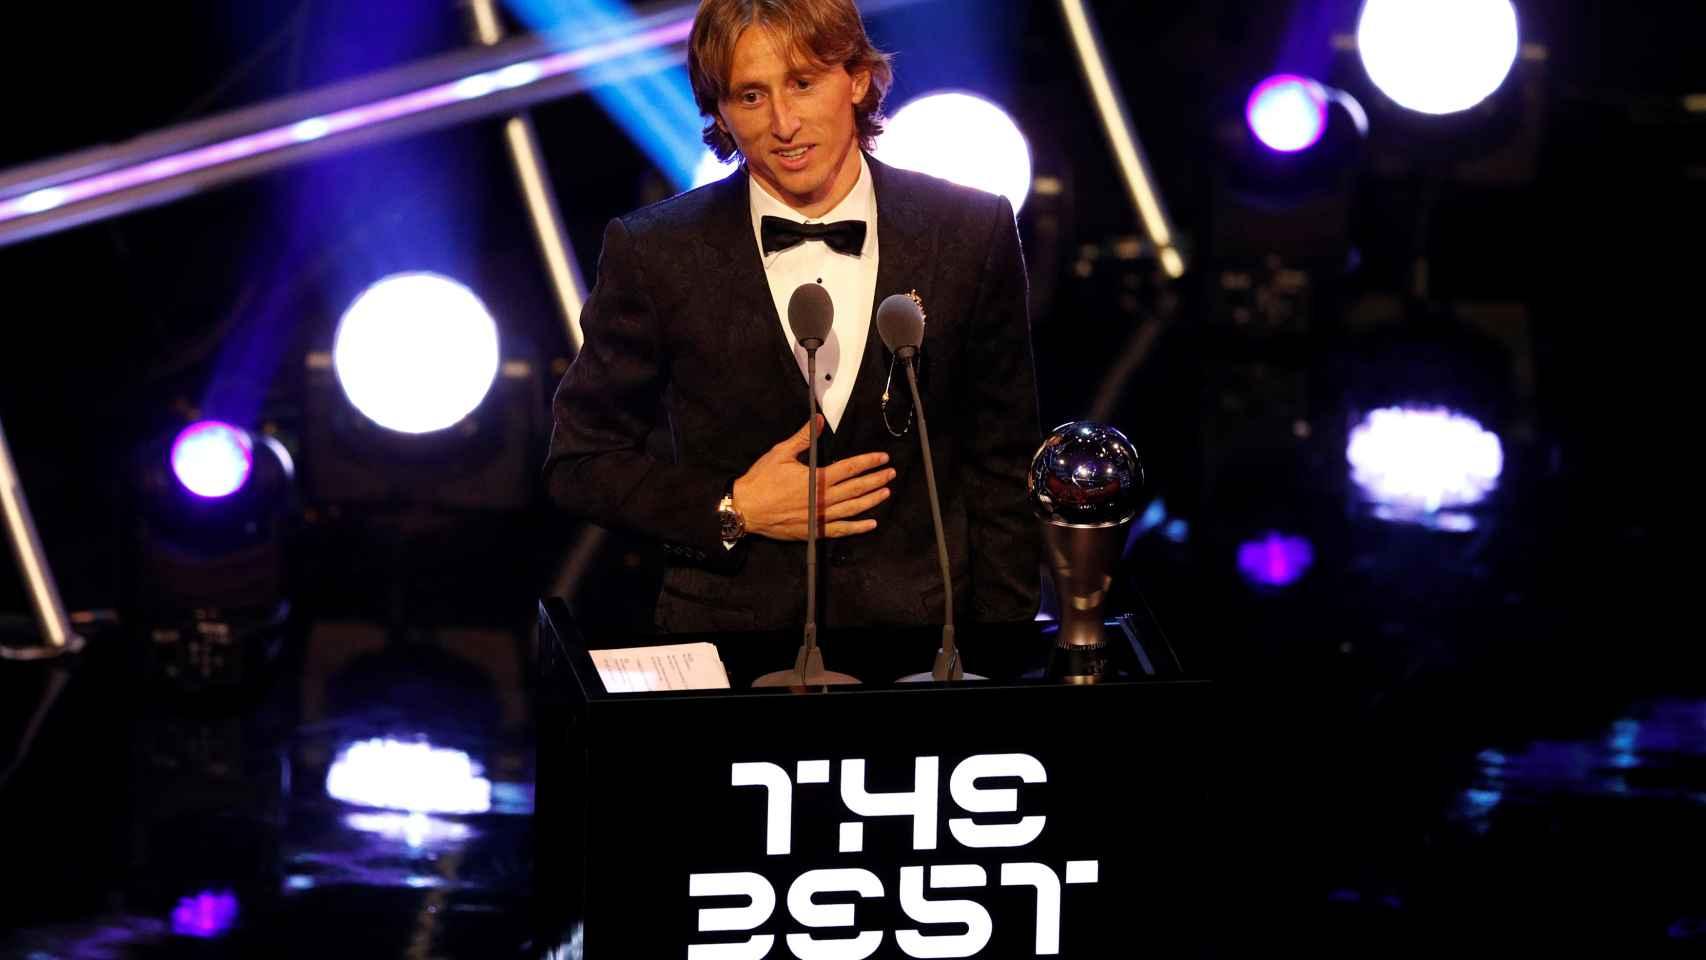 Modric recoge el premio The Best de la FIFA